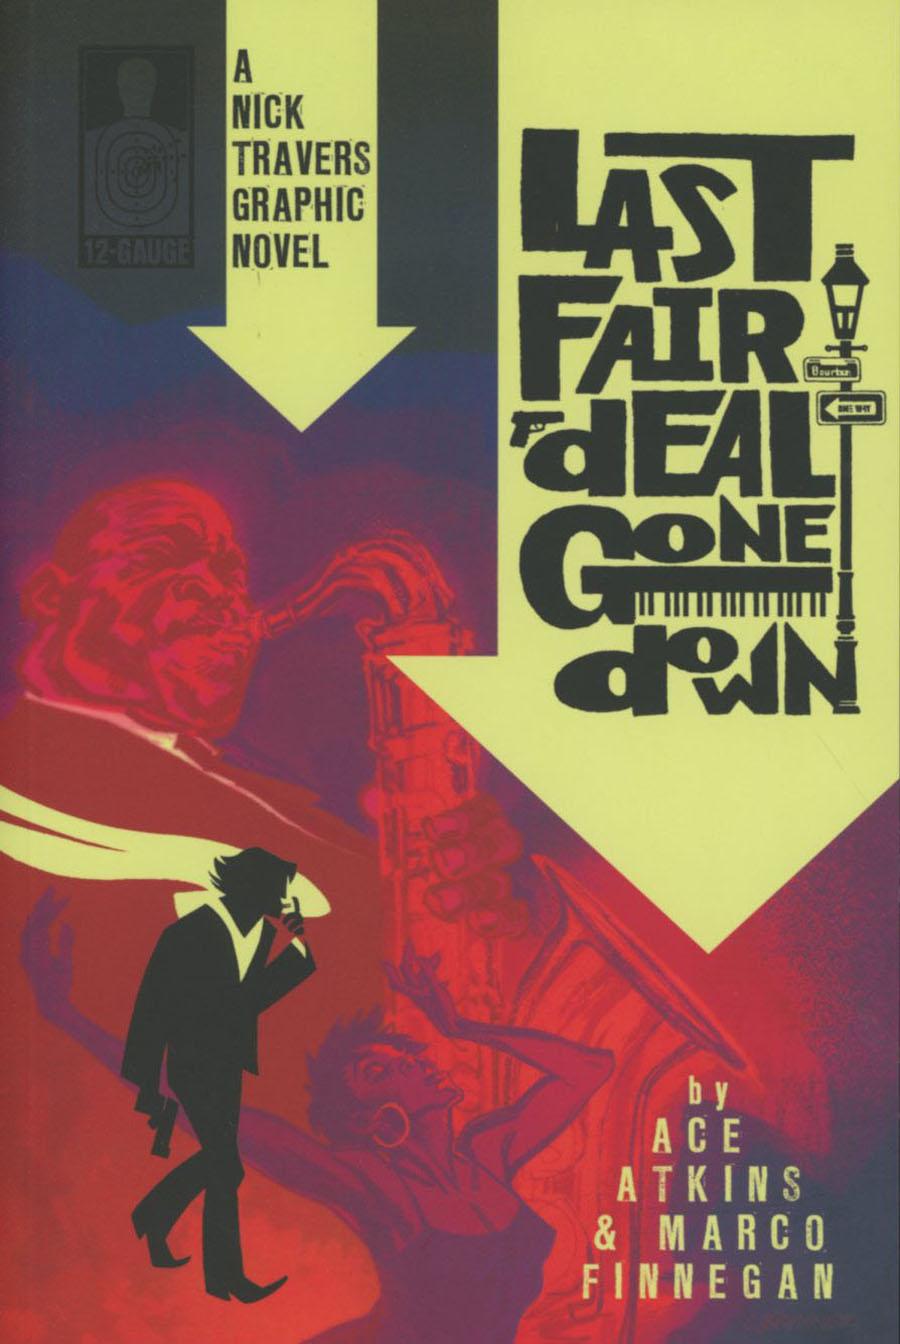 Nick Travers Vol 1 Last Fair Deal Gone Down GN